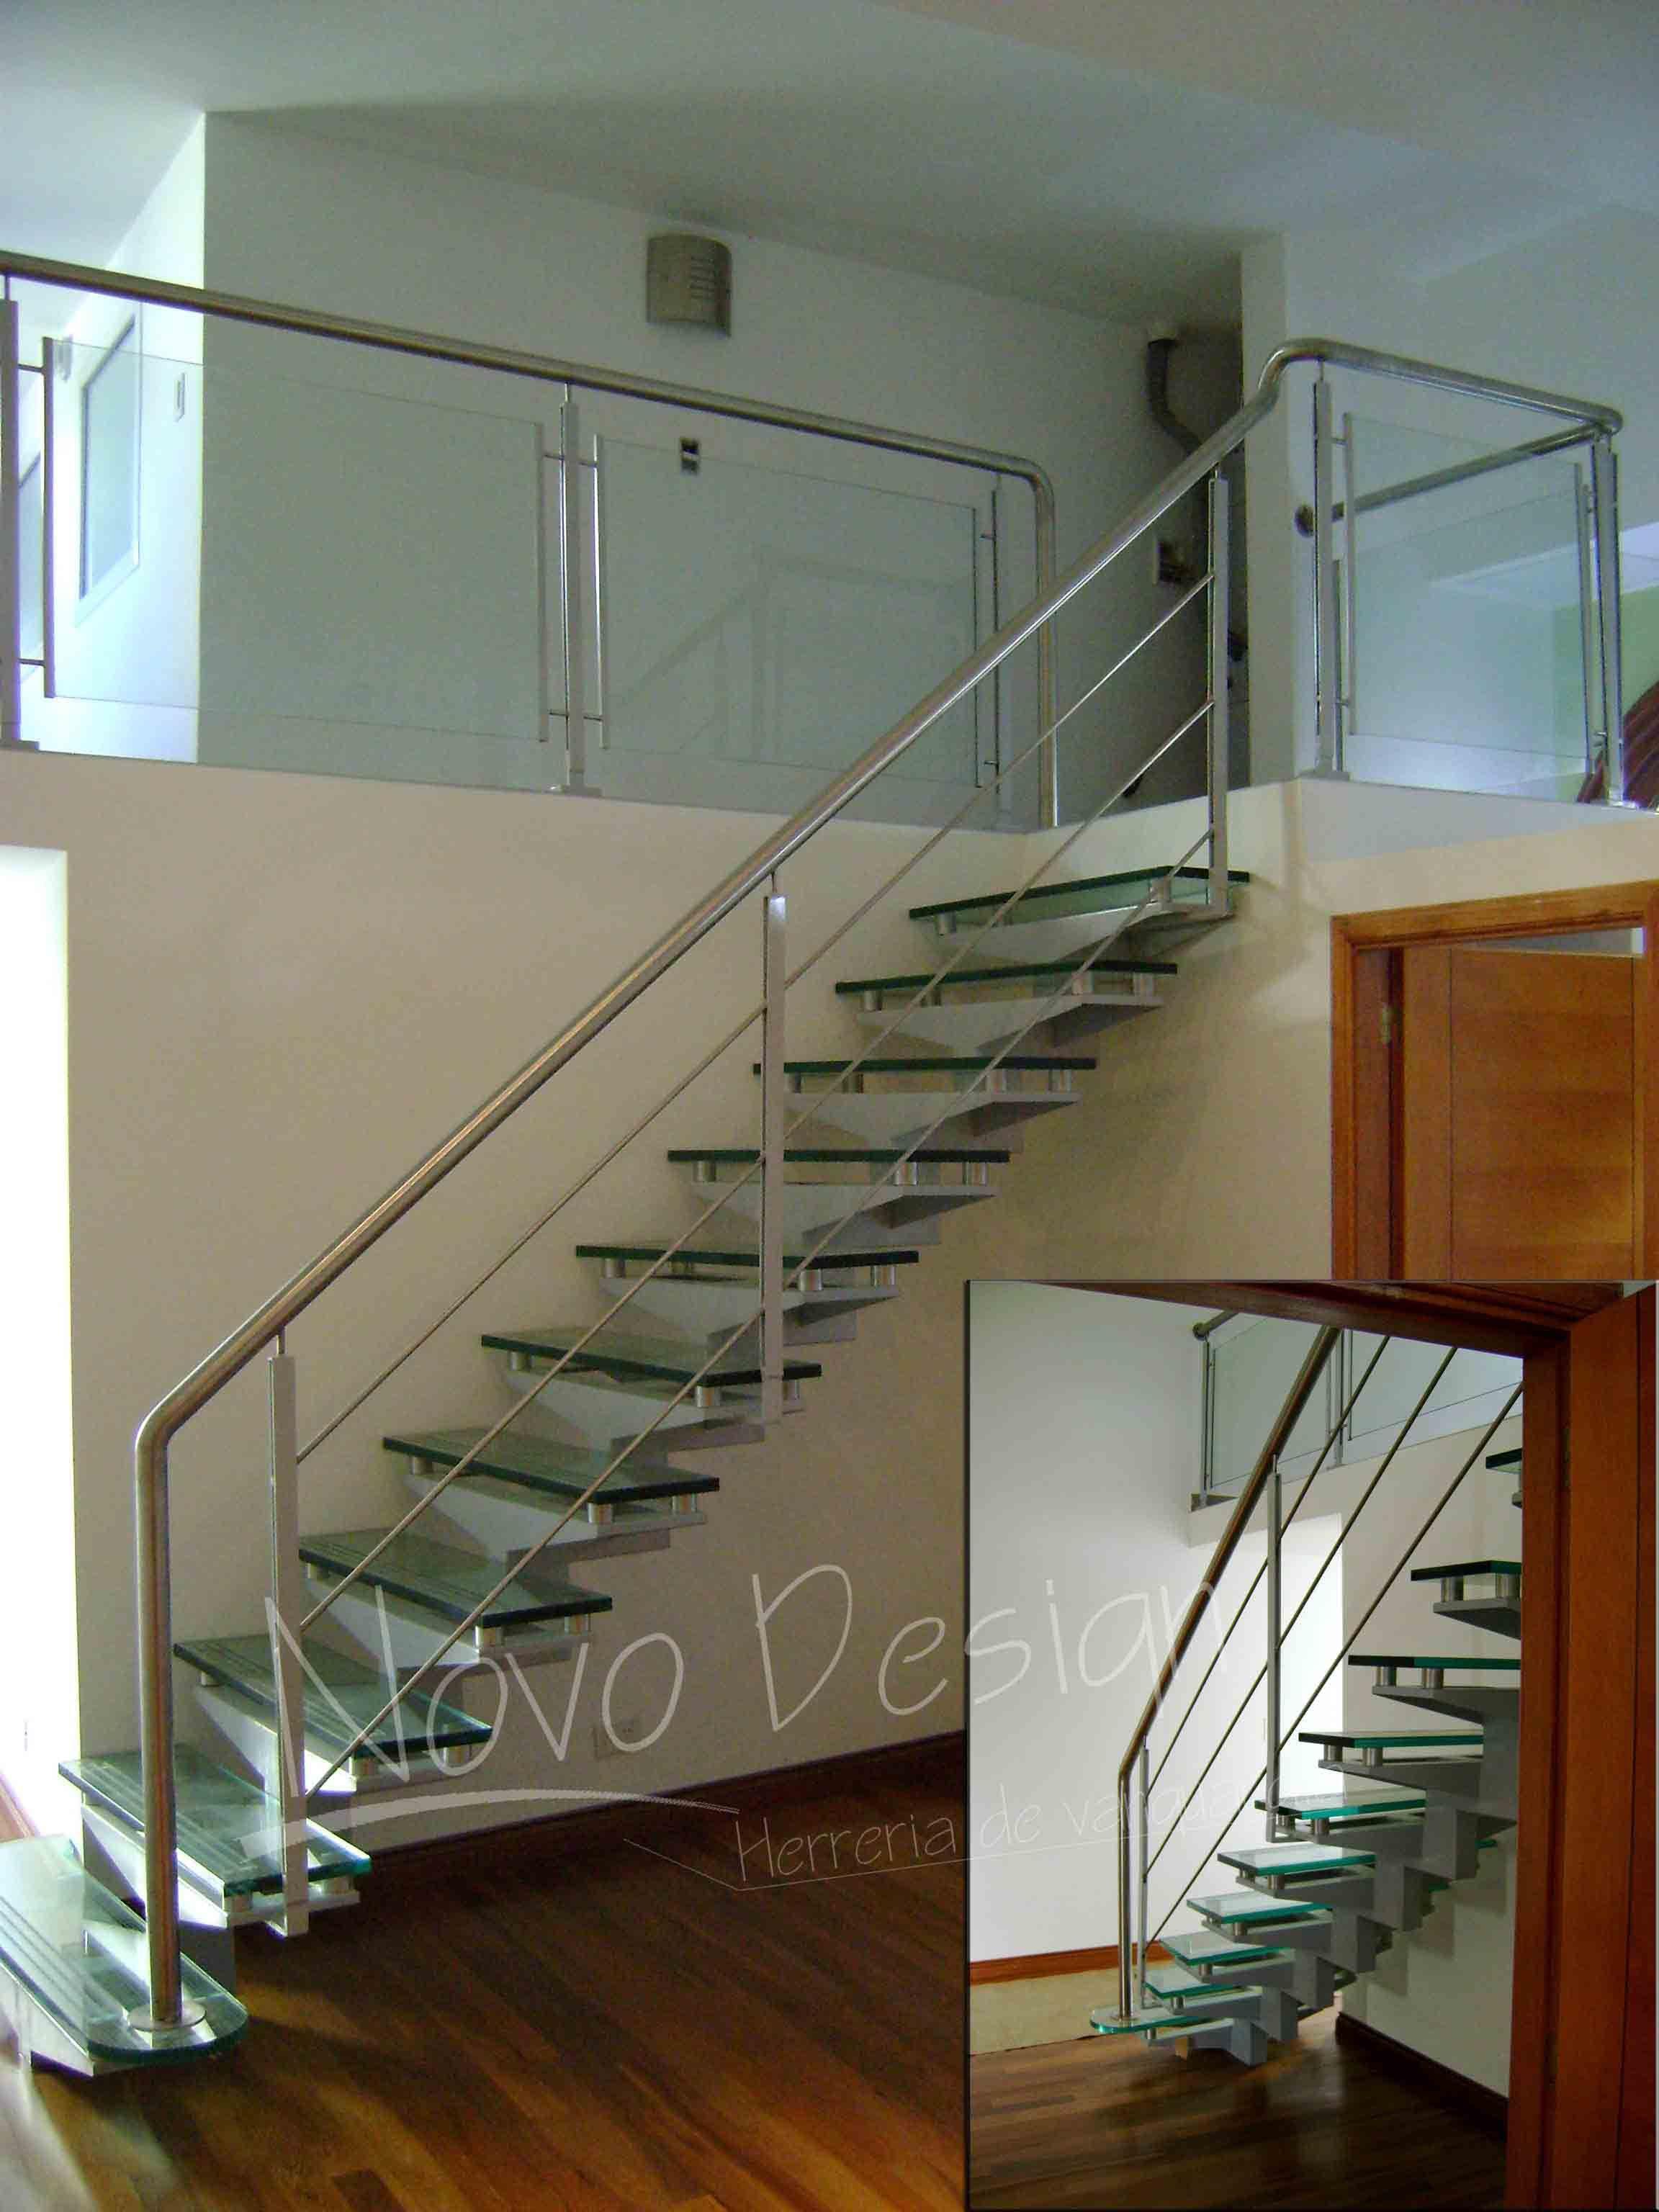 Barandas de escaleras interiores escaleras interiores by for Escalera madera sodimac